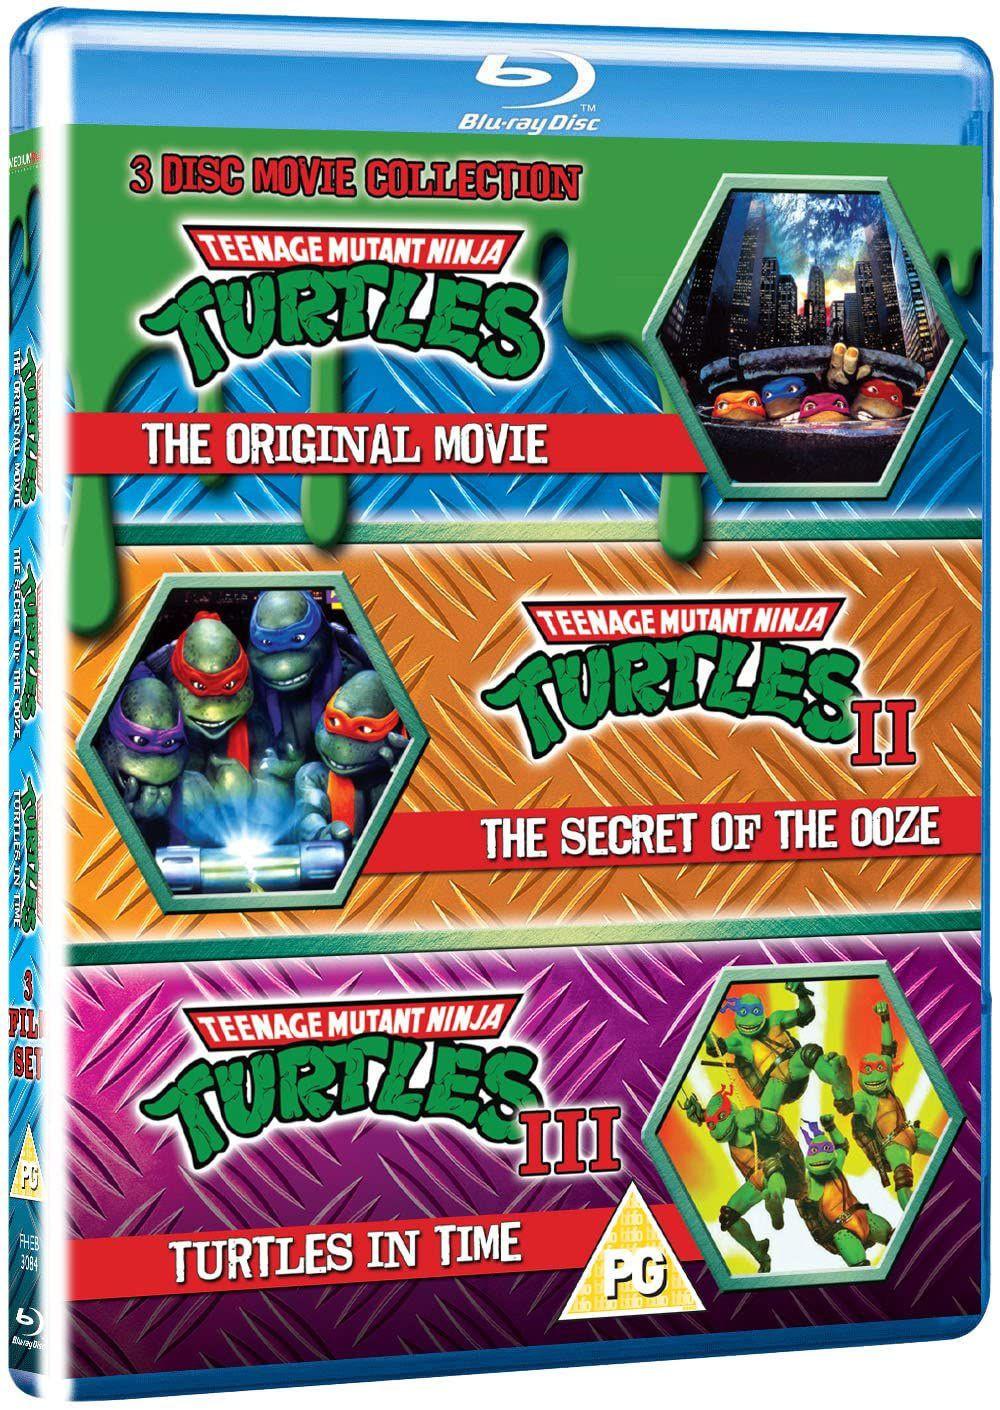 TMNT - 3 Disc Set (Teenage Mutant Ninja Turtles/Secret Of The Ooze/Turtles In Time) (Blu-ray) £9.15 + £2.99 NP @ Amazon